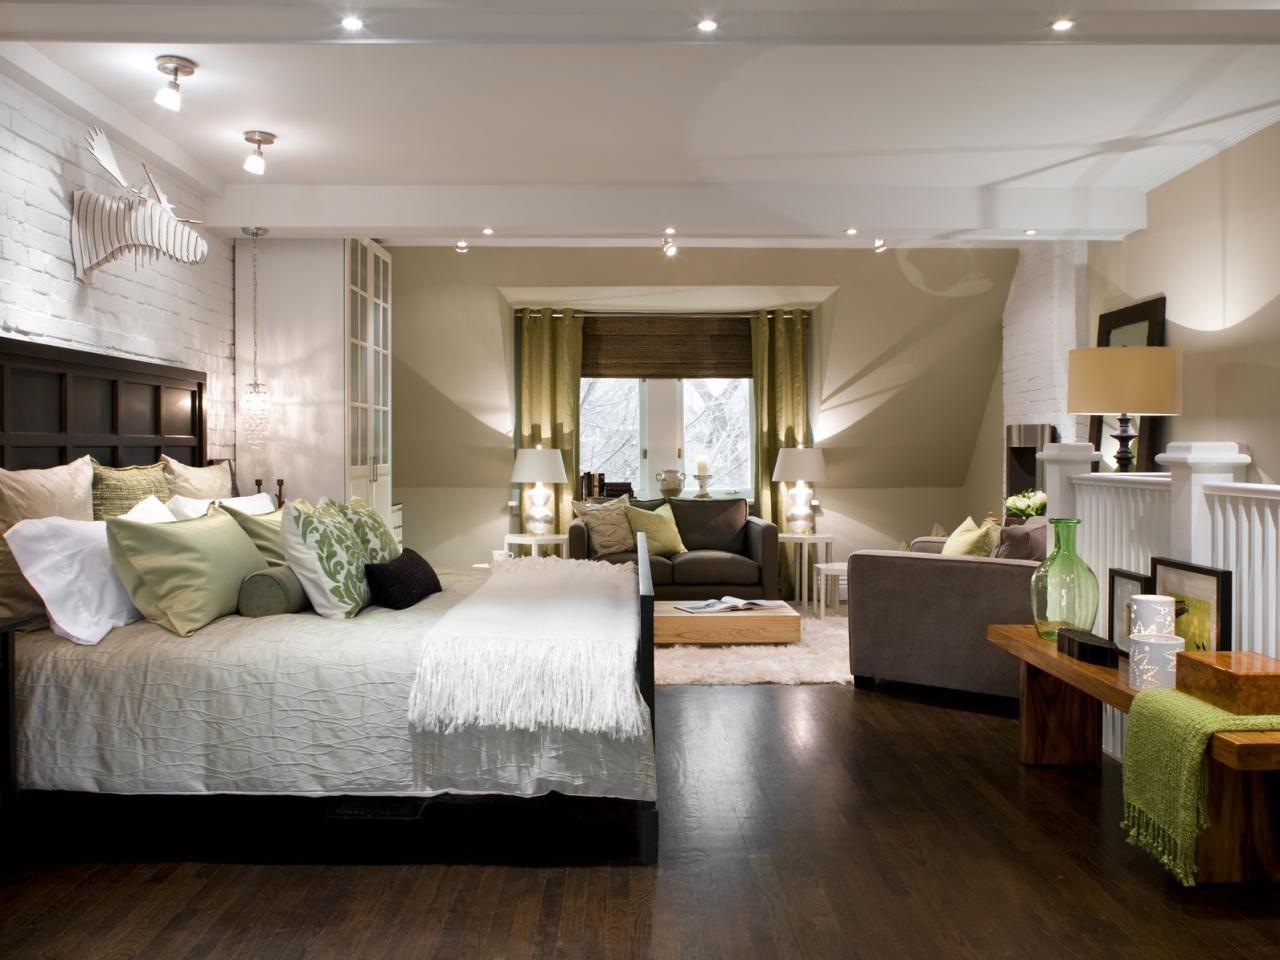 cozy bedroom retreat a fresh coat of white paint freshens up